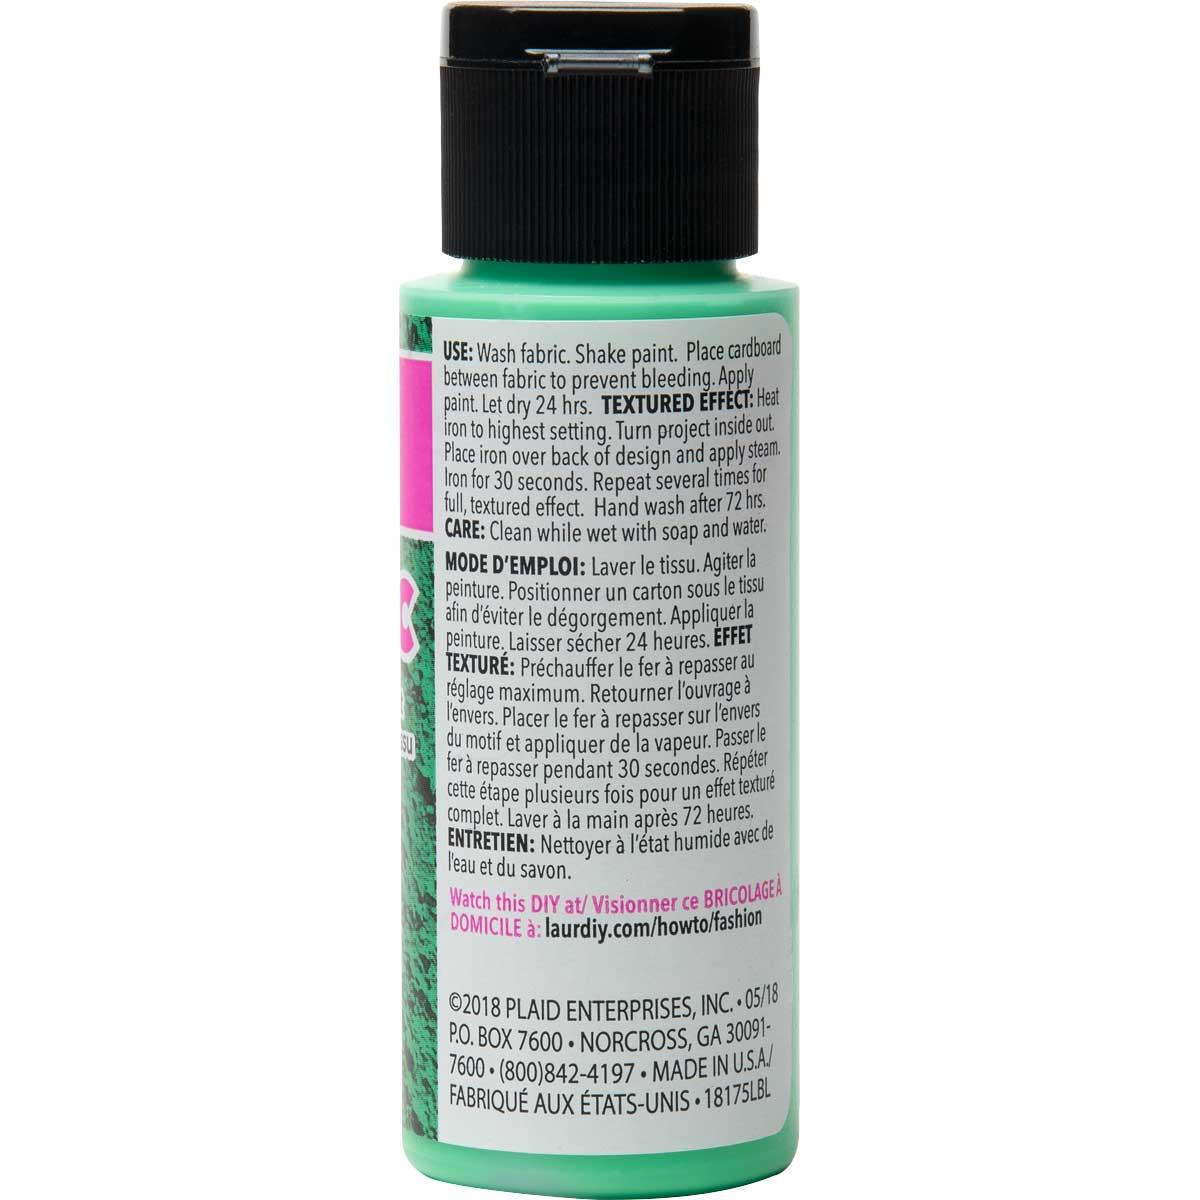 LaurDIY ® Texturific™ Fabric Paint - Everest, 2 oz.